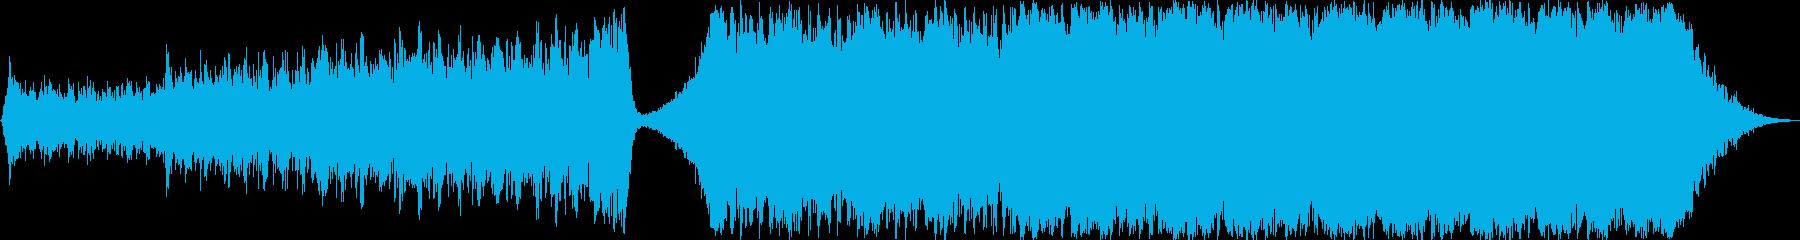 Action Radiusの再生済みの波形